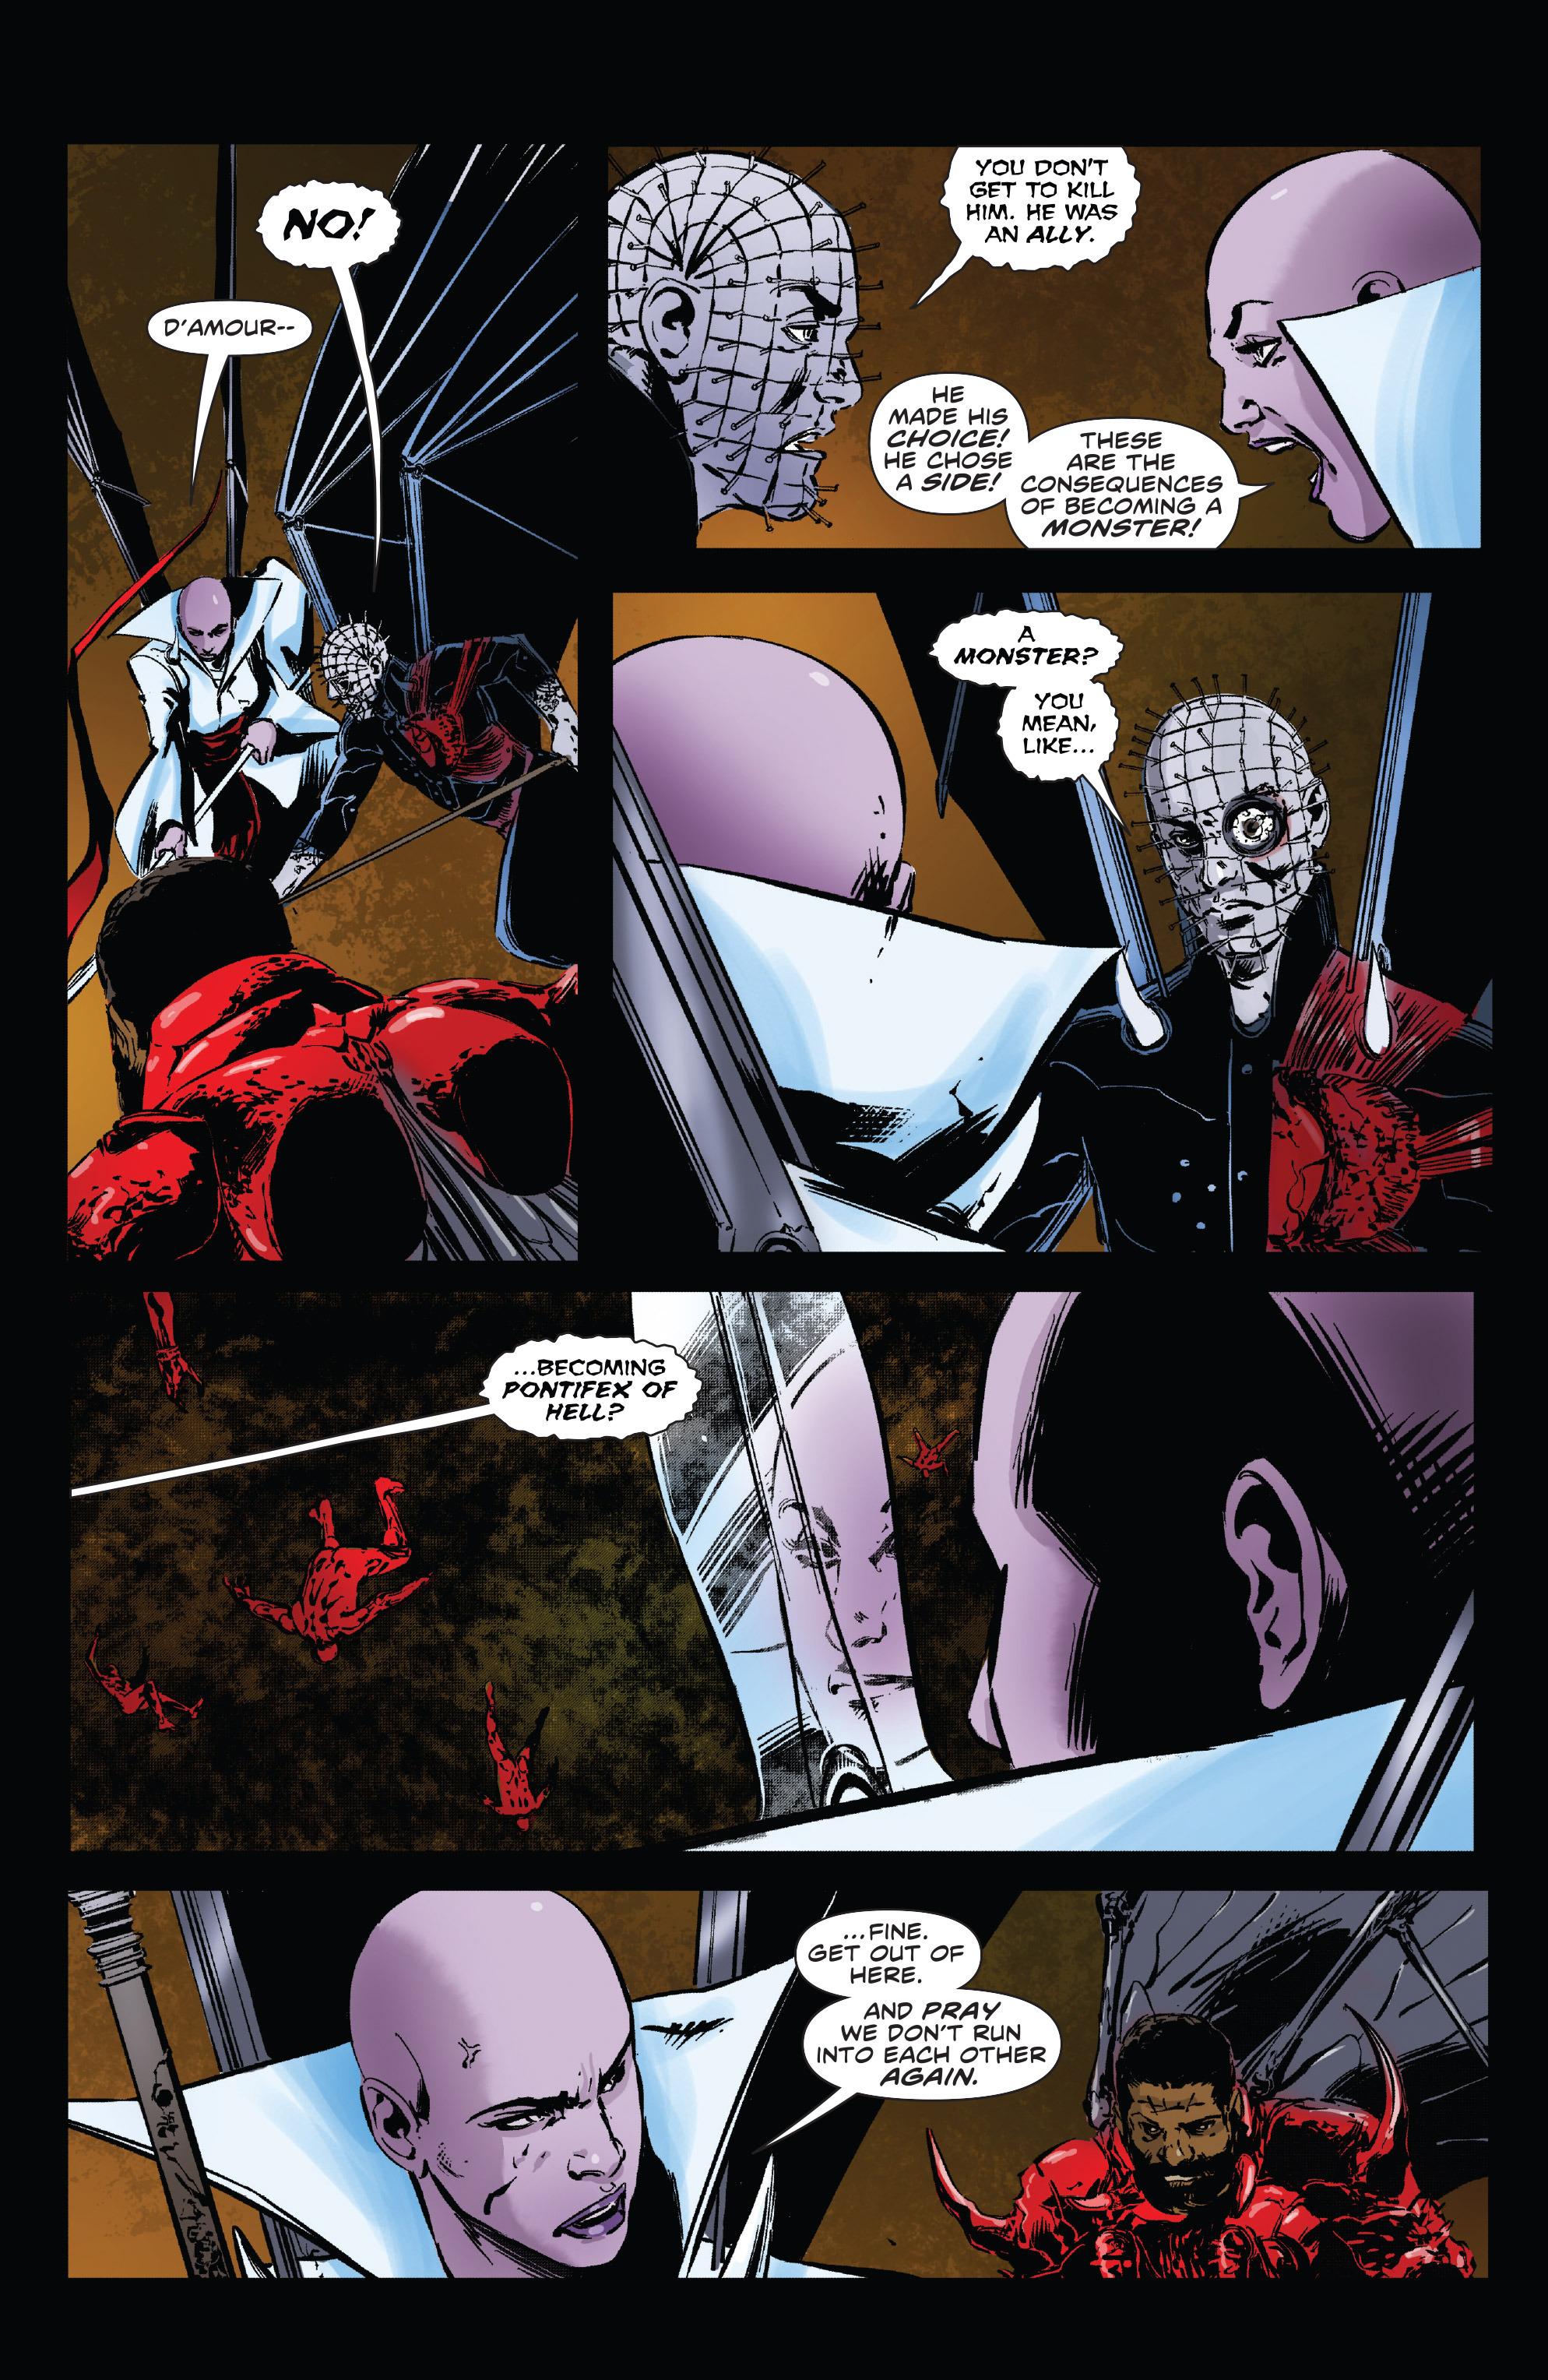 Read online Clive Barker's Hellraiser: The Dark Watch comic -  Issue # TPB 3 - 70